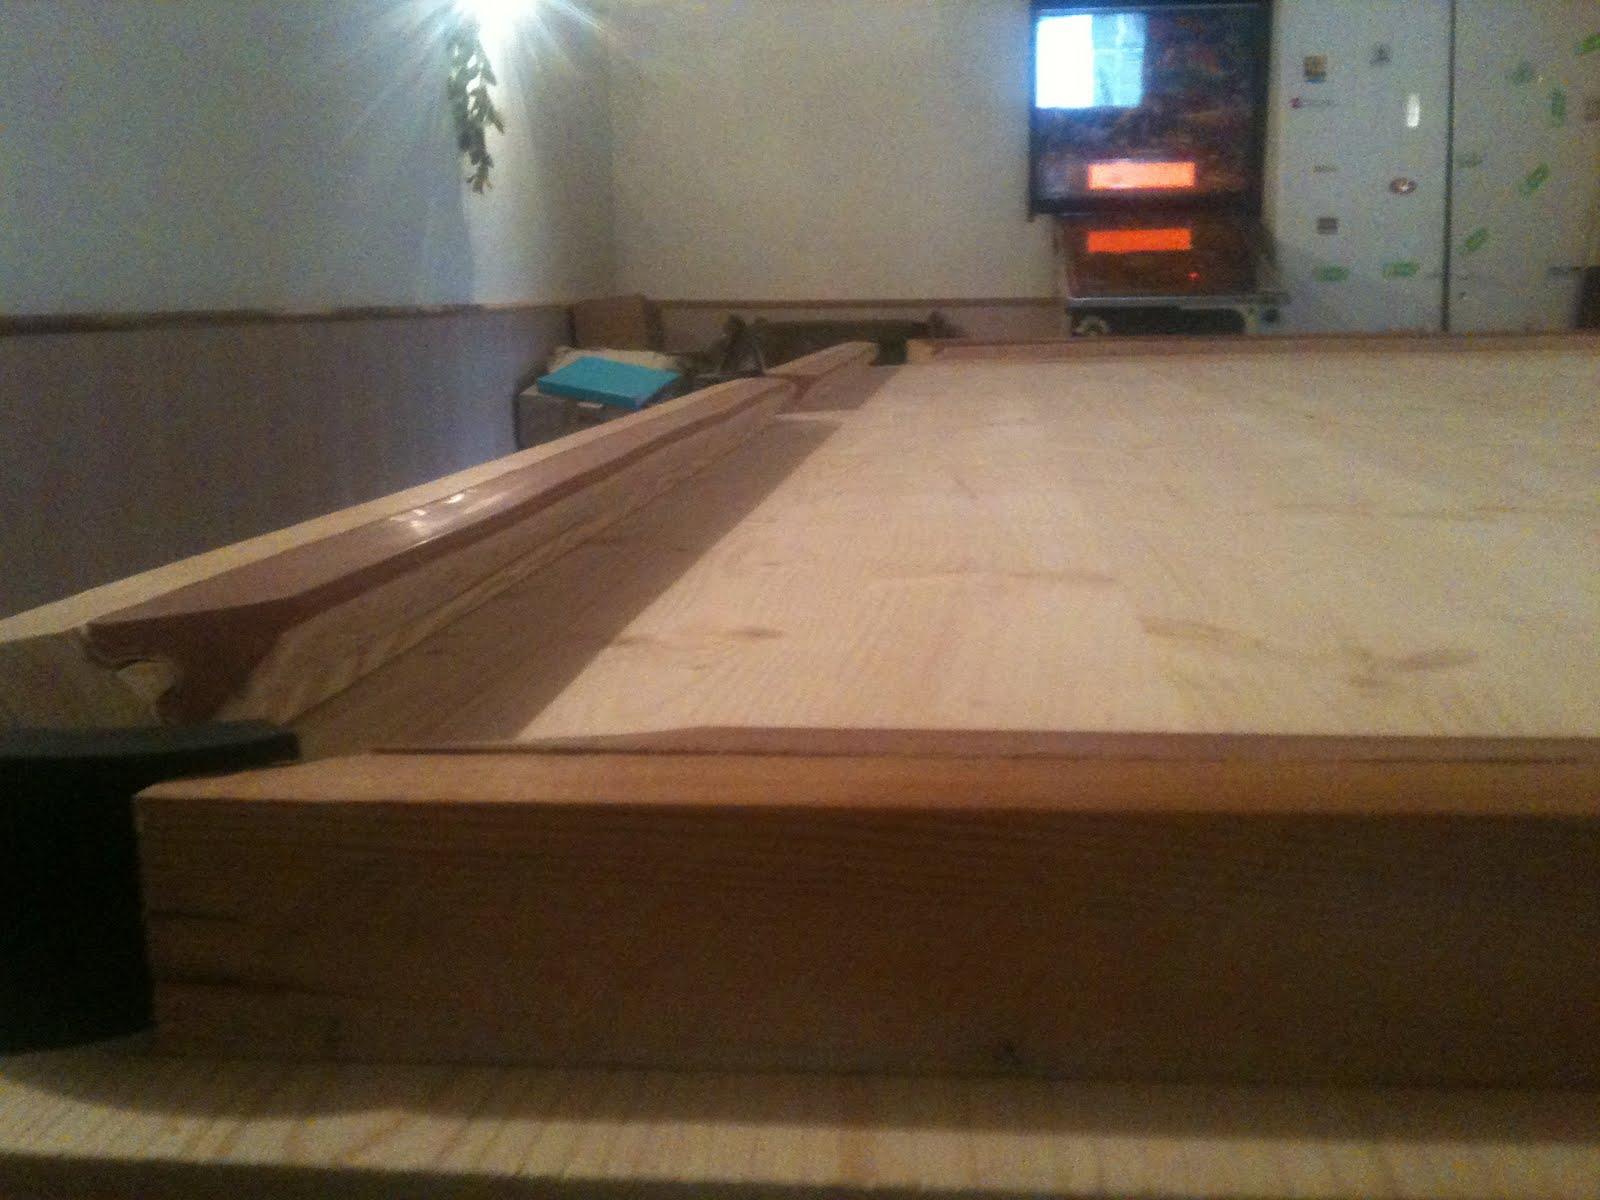 fabriquer son billard comment construire un billard. Black Bedroom Furniture Sets. Home Design Ideas